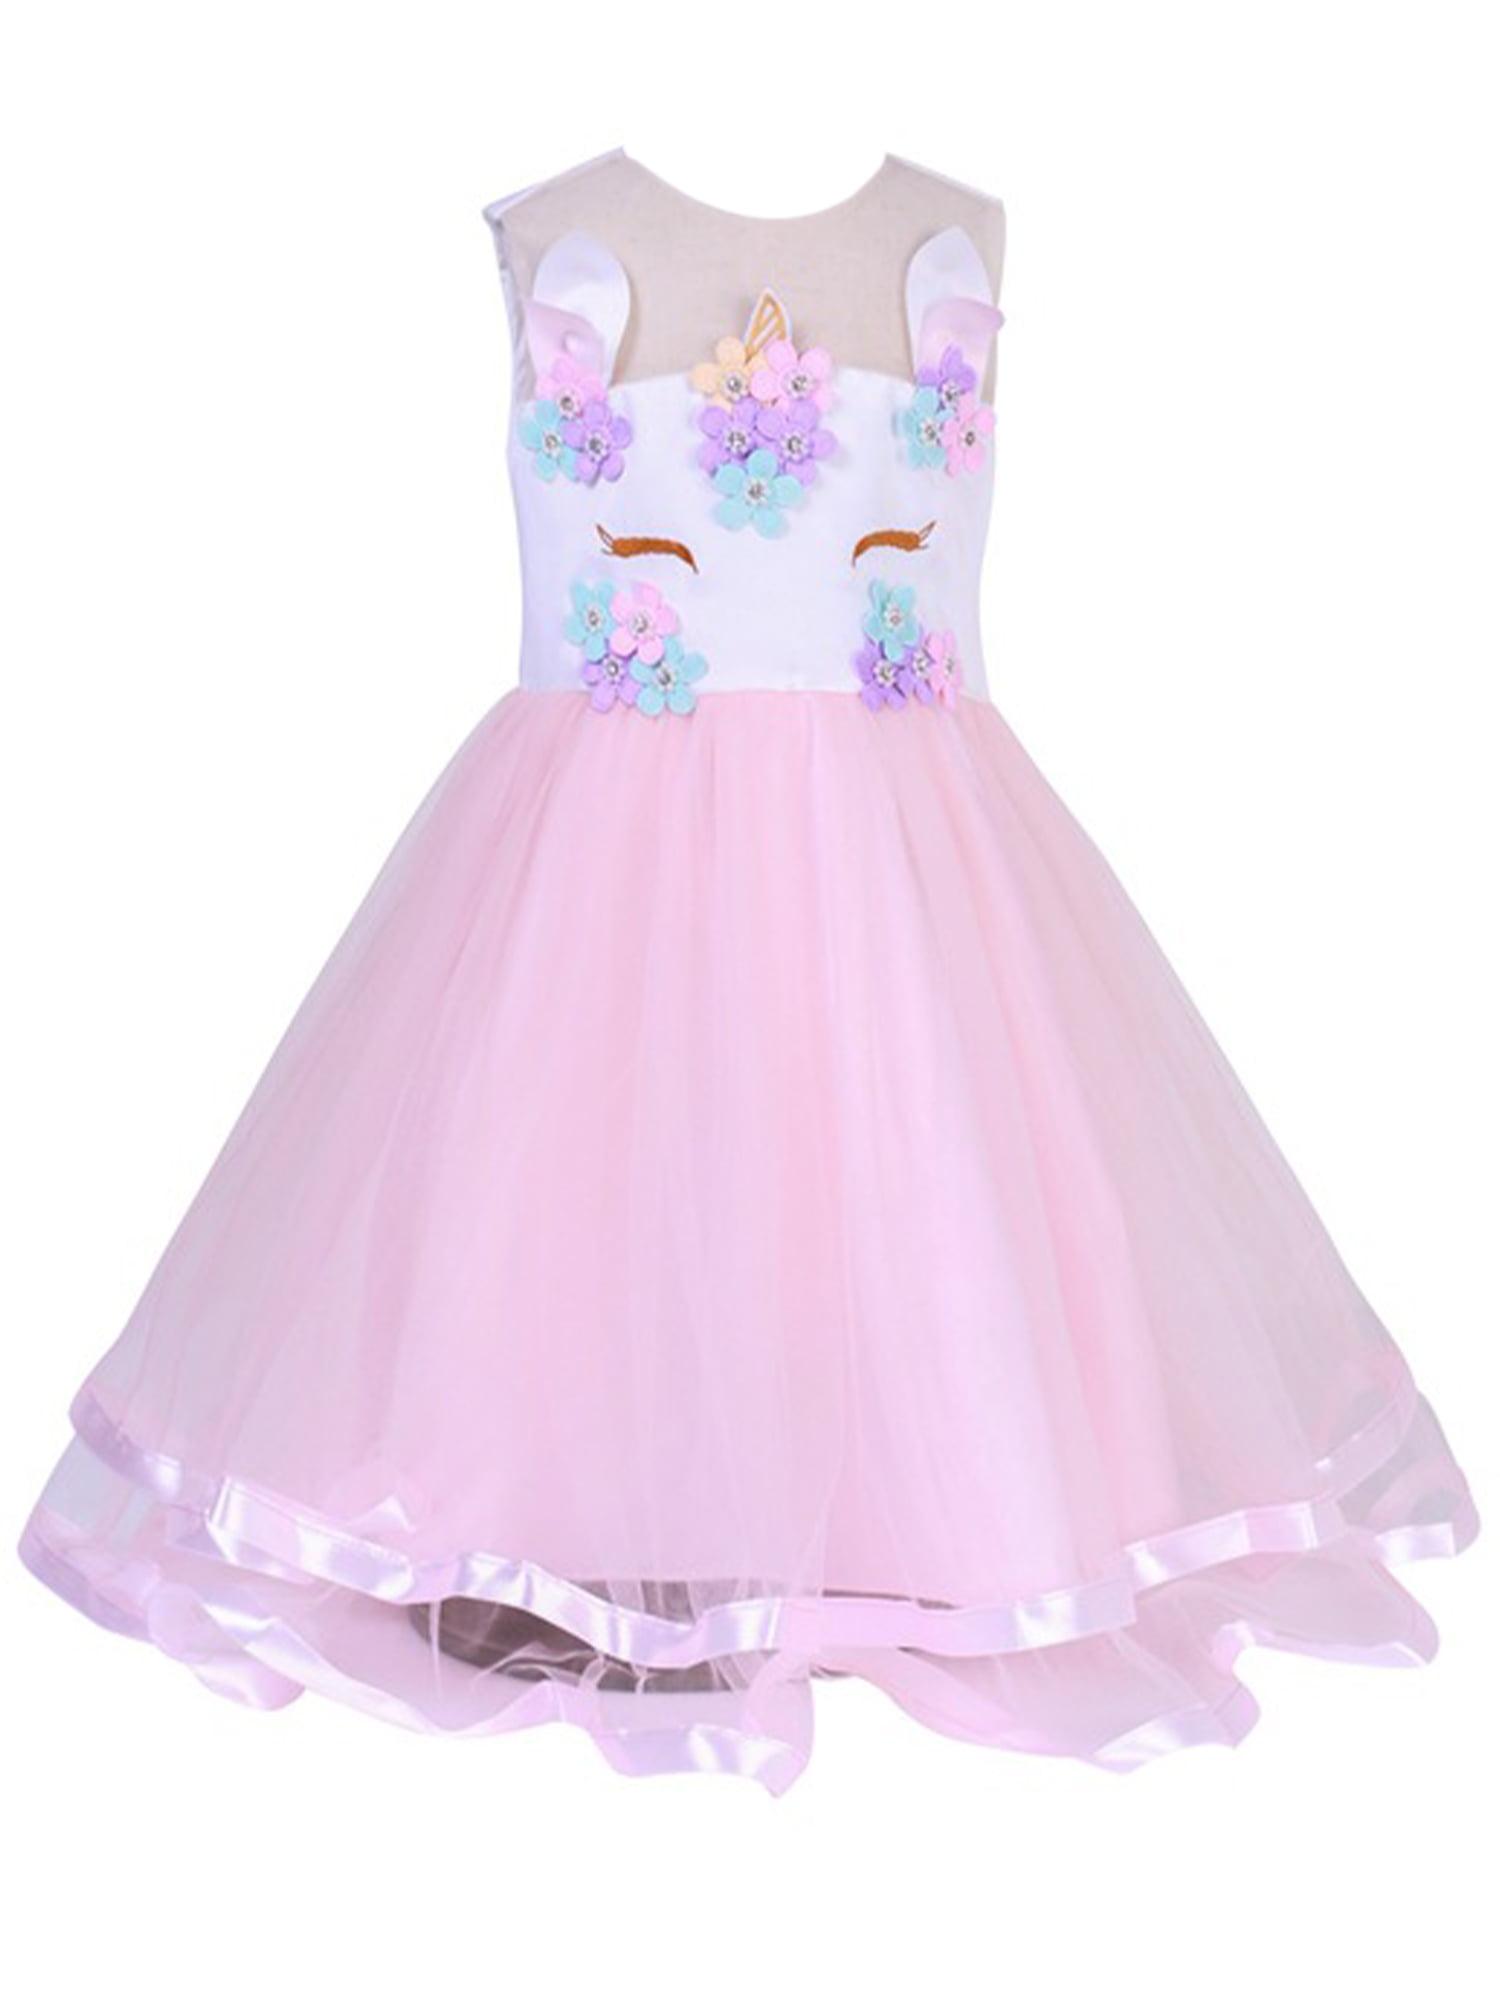 Kids Girls Princess Tutu Tulle Wedding Birthday Party Ball Gown Dress 2-10Years